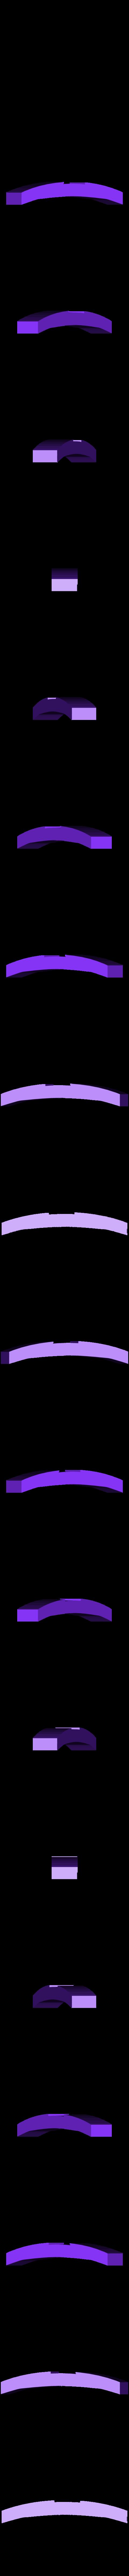 platform_cradle_front.stl Download free STL file Gowanus Monster - Margo Series • 3D printable object, boldmachines